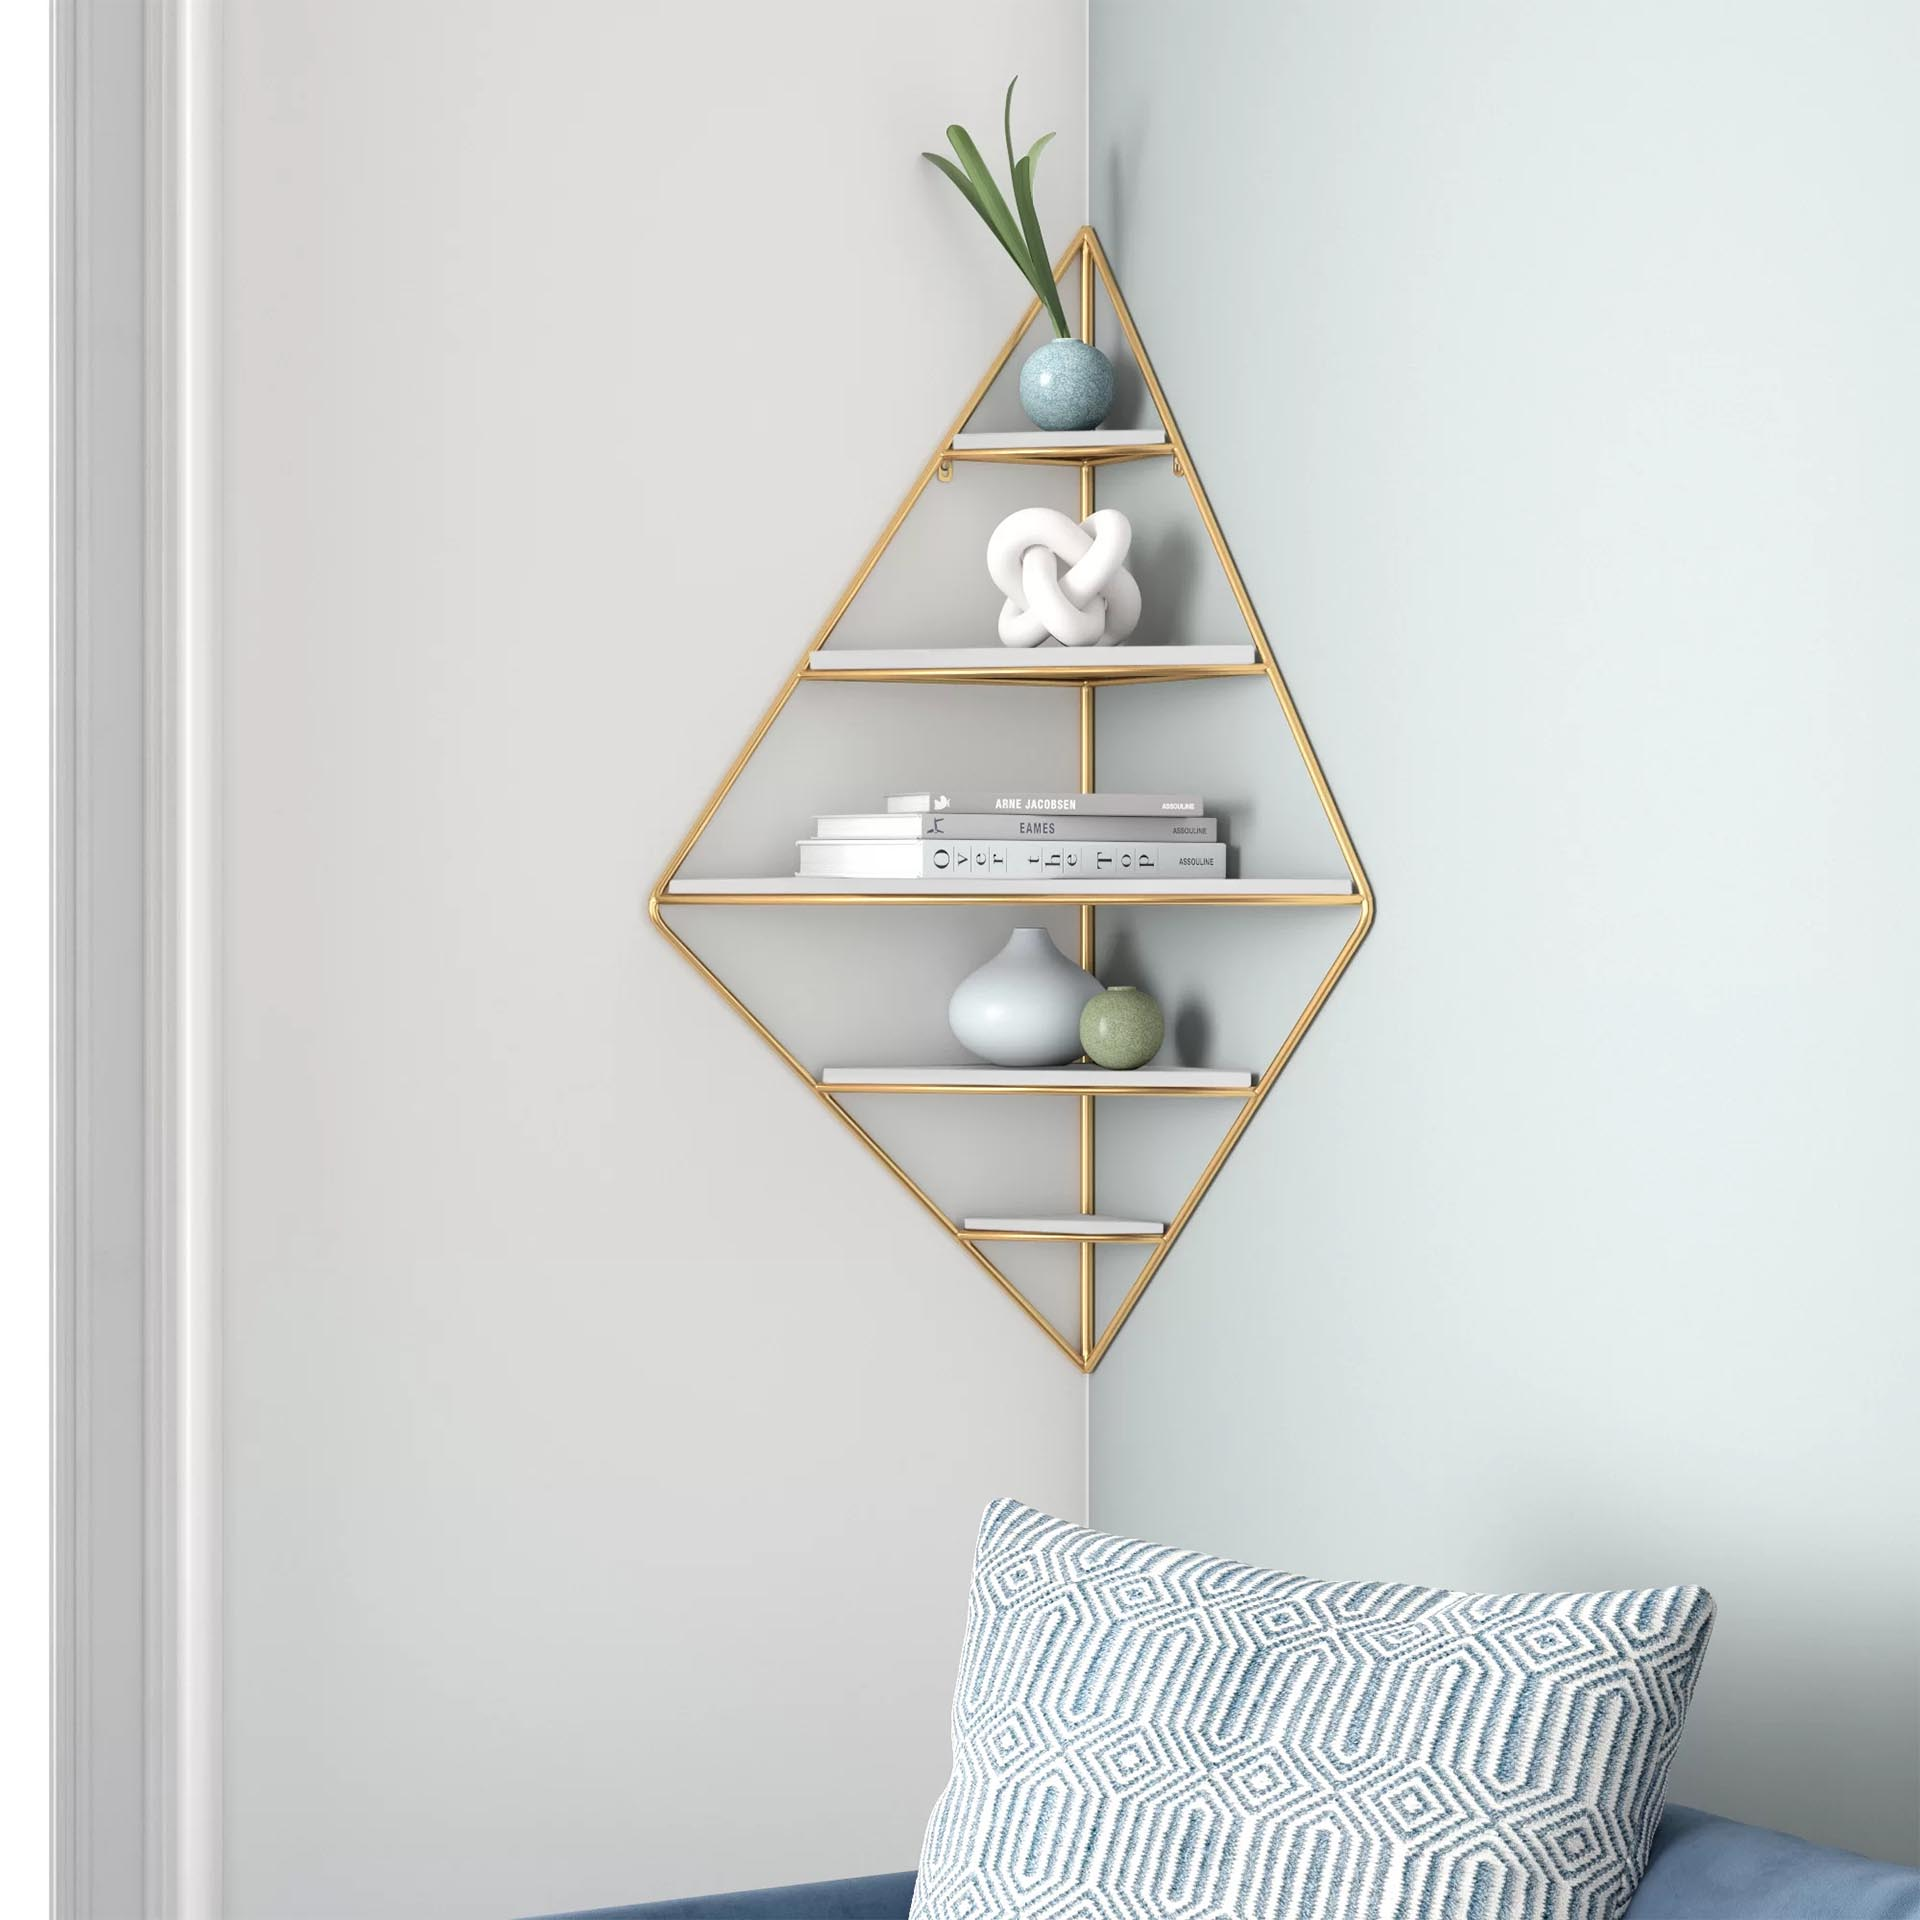 Corner Shelf Ideas - A mid-century modern corner shelf.